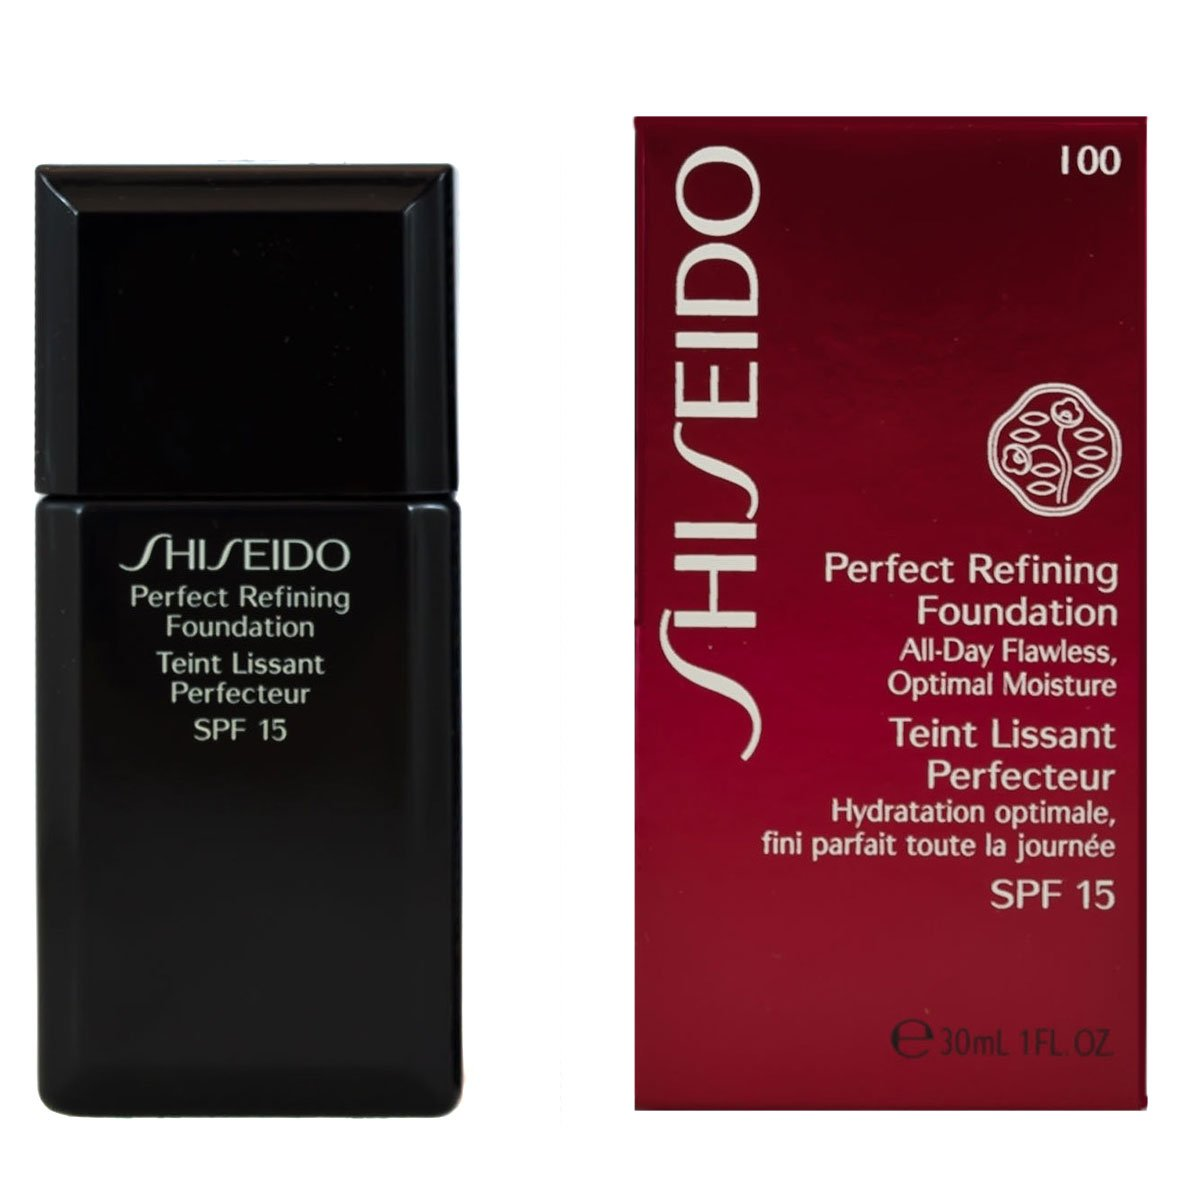 Shiseido Shiseido Perfect Refining Foundation - Very Light Ivory, 30 ml